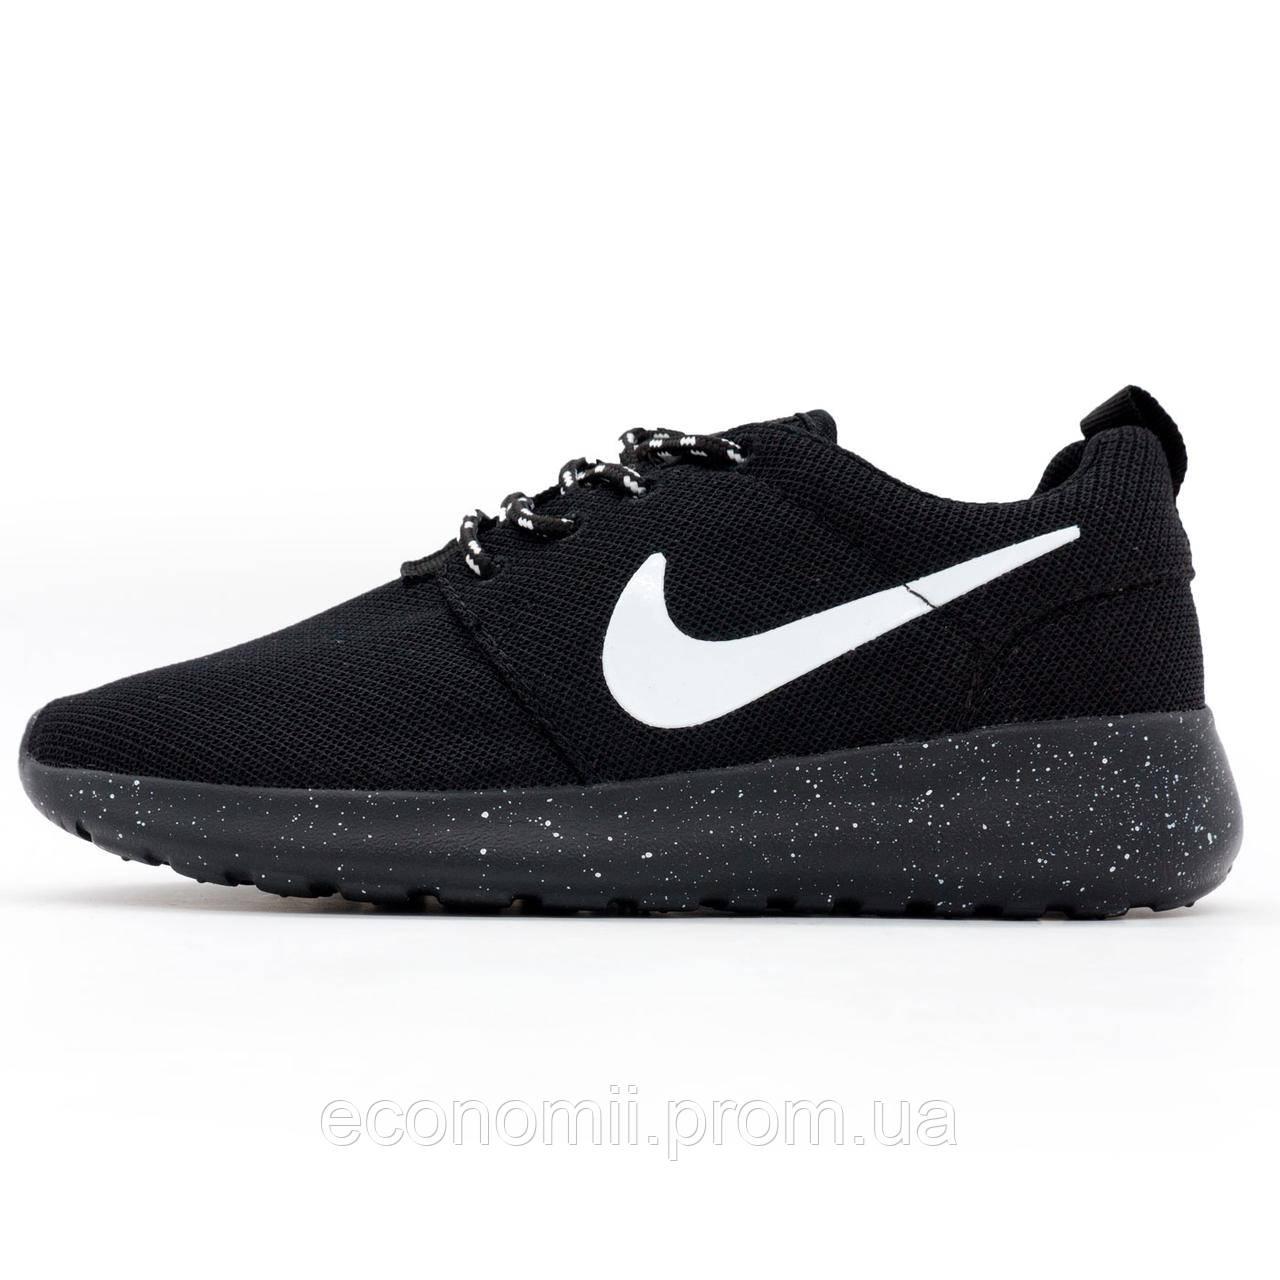 438d154612f3ae Nike Roshe Run полностью черные в крапинку. Топ качество!!! р.(37 ...